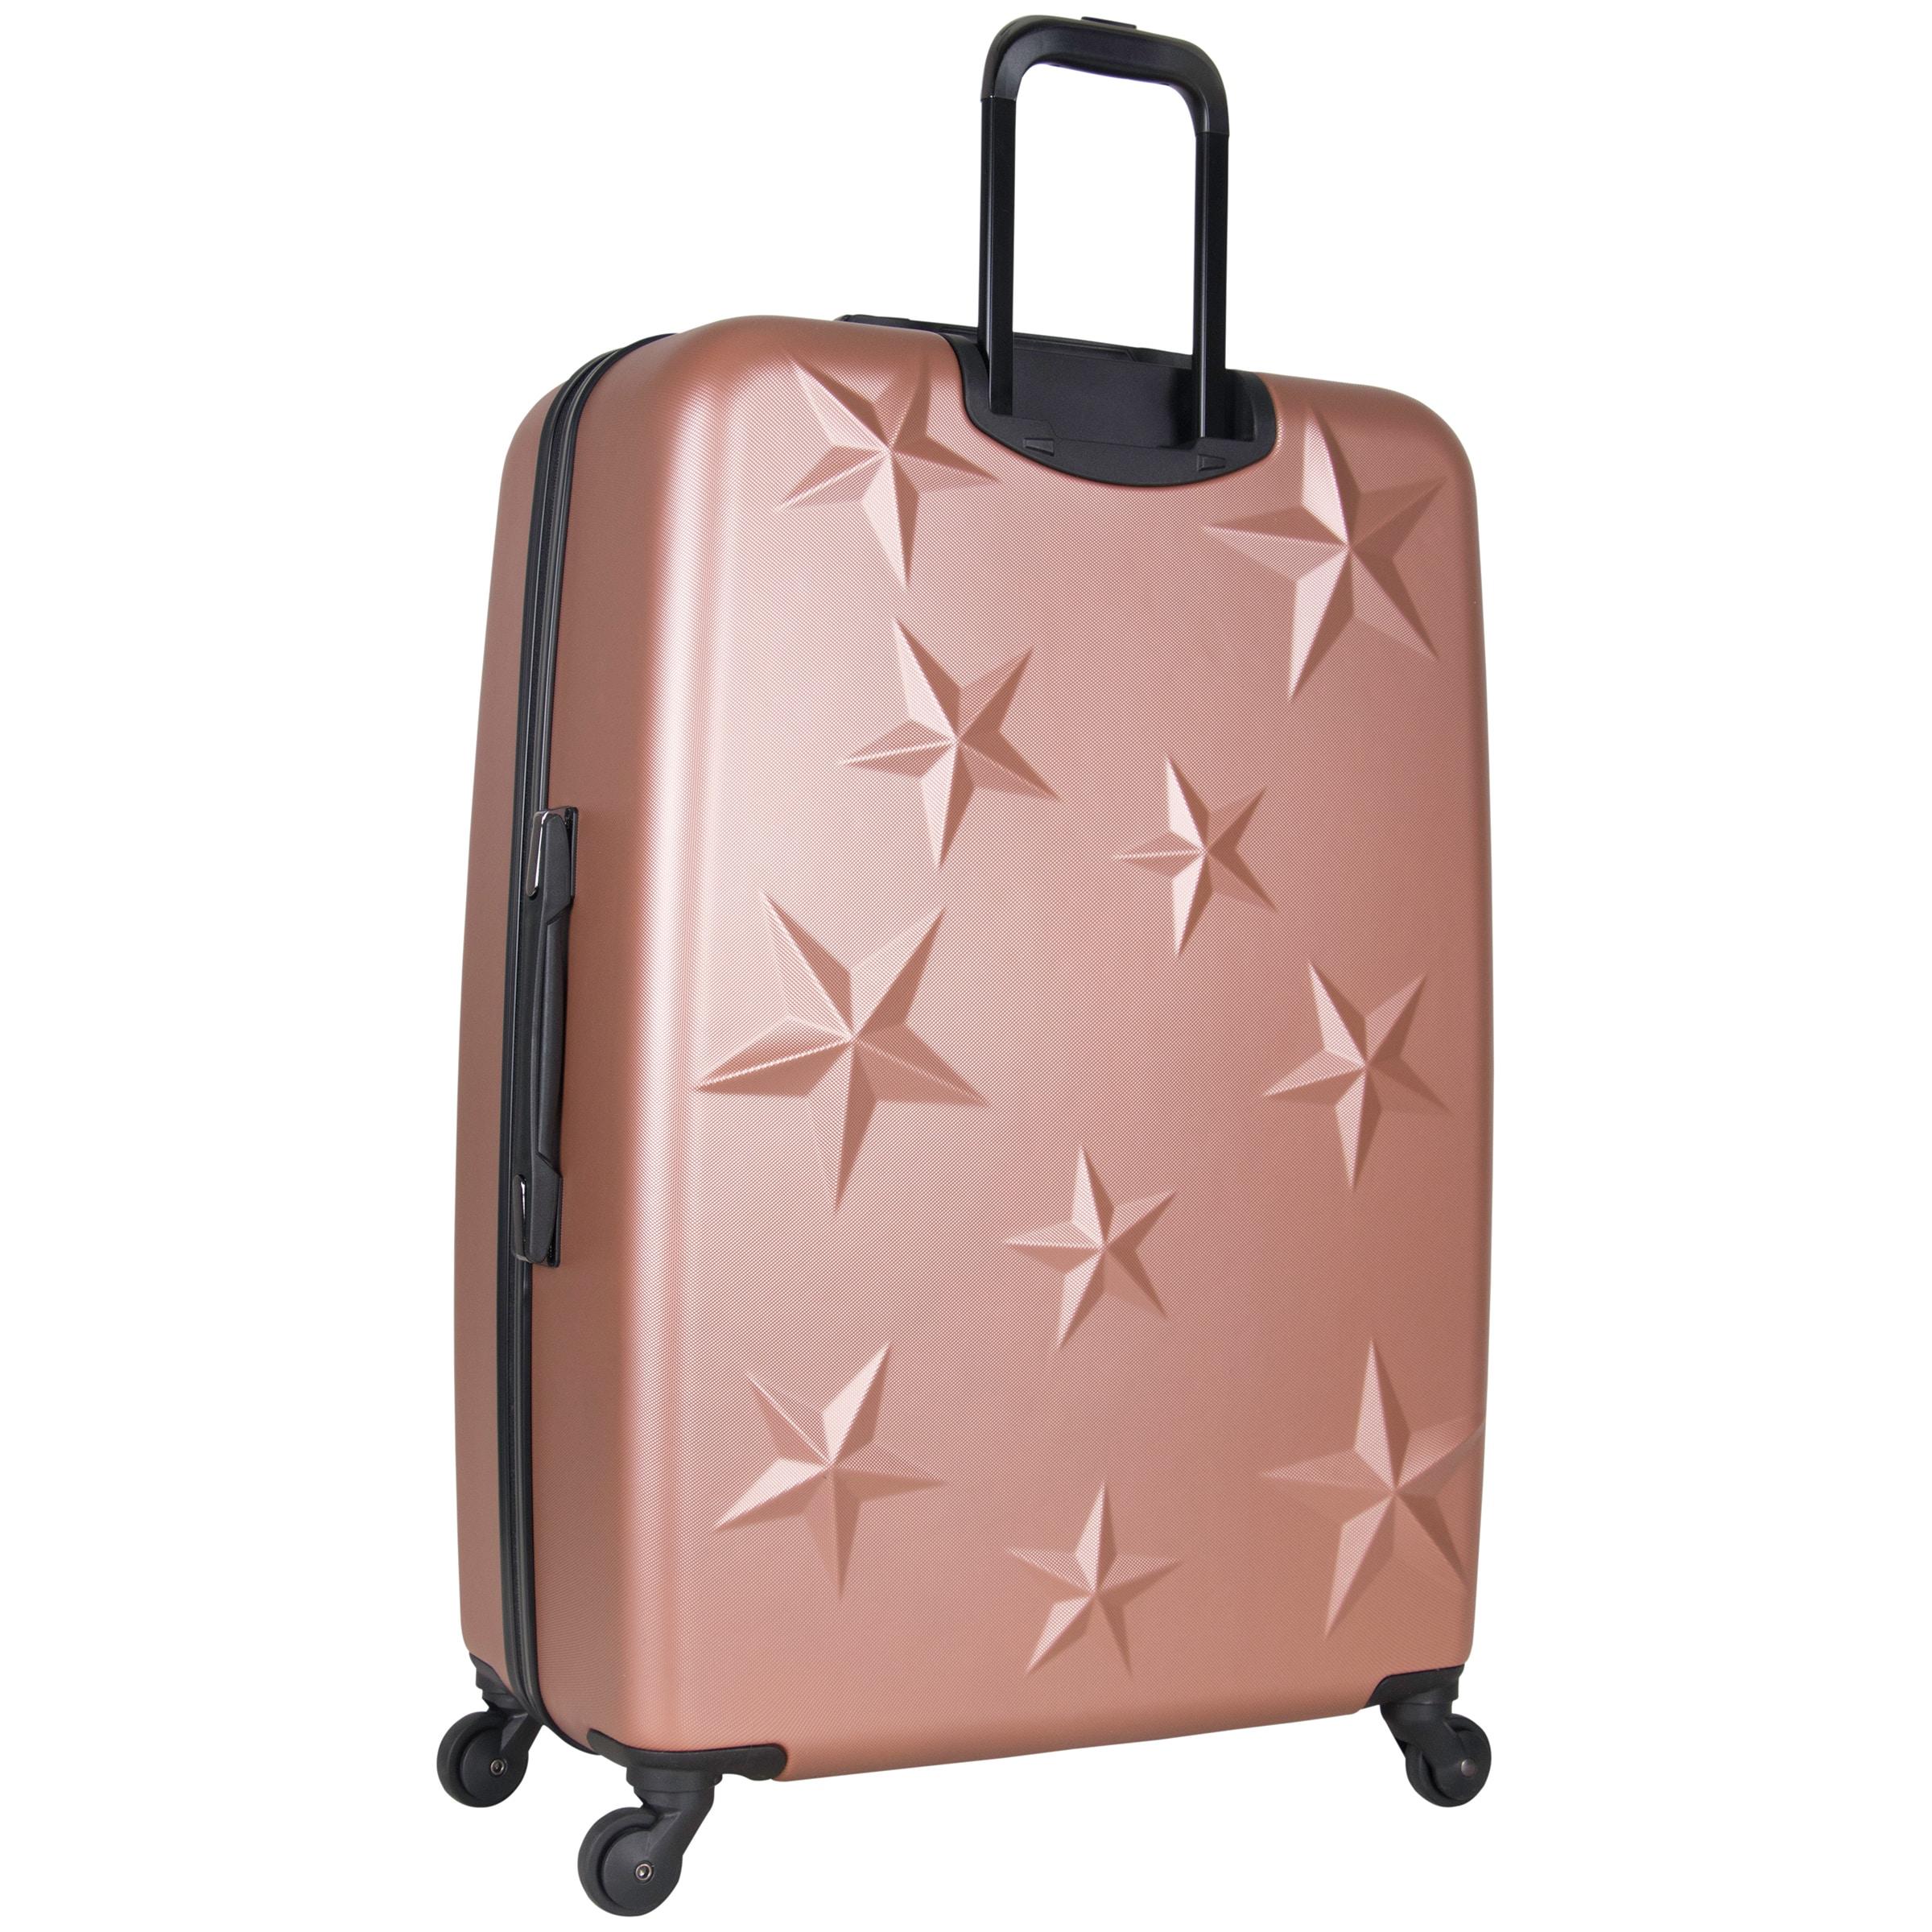 6a5c982b81c6 Aimee Kestenberg 'Star Journey' 3-Piece Lightweight Star Embossed Hardside  4-Wheel Spinner Upright Luggage Set